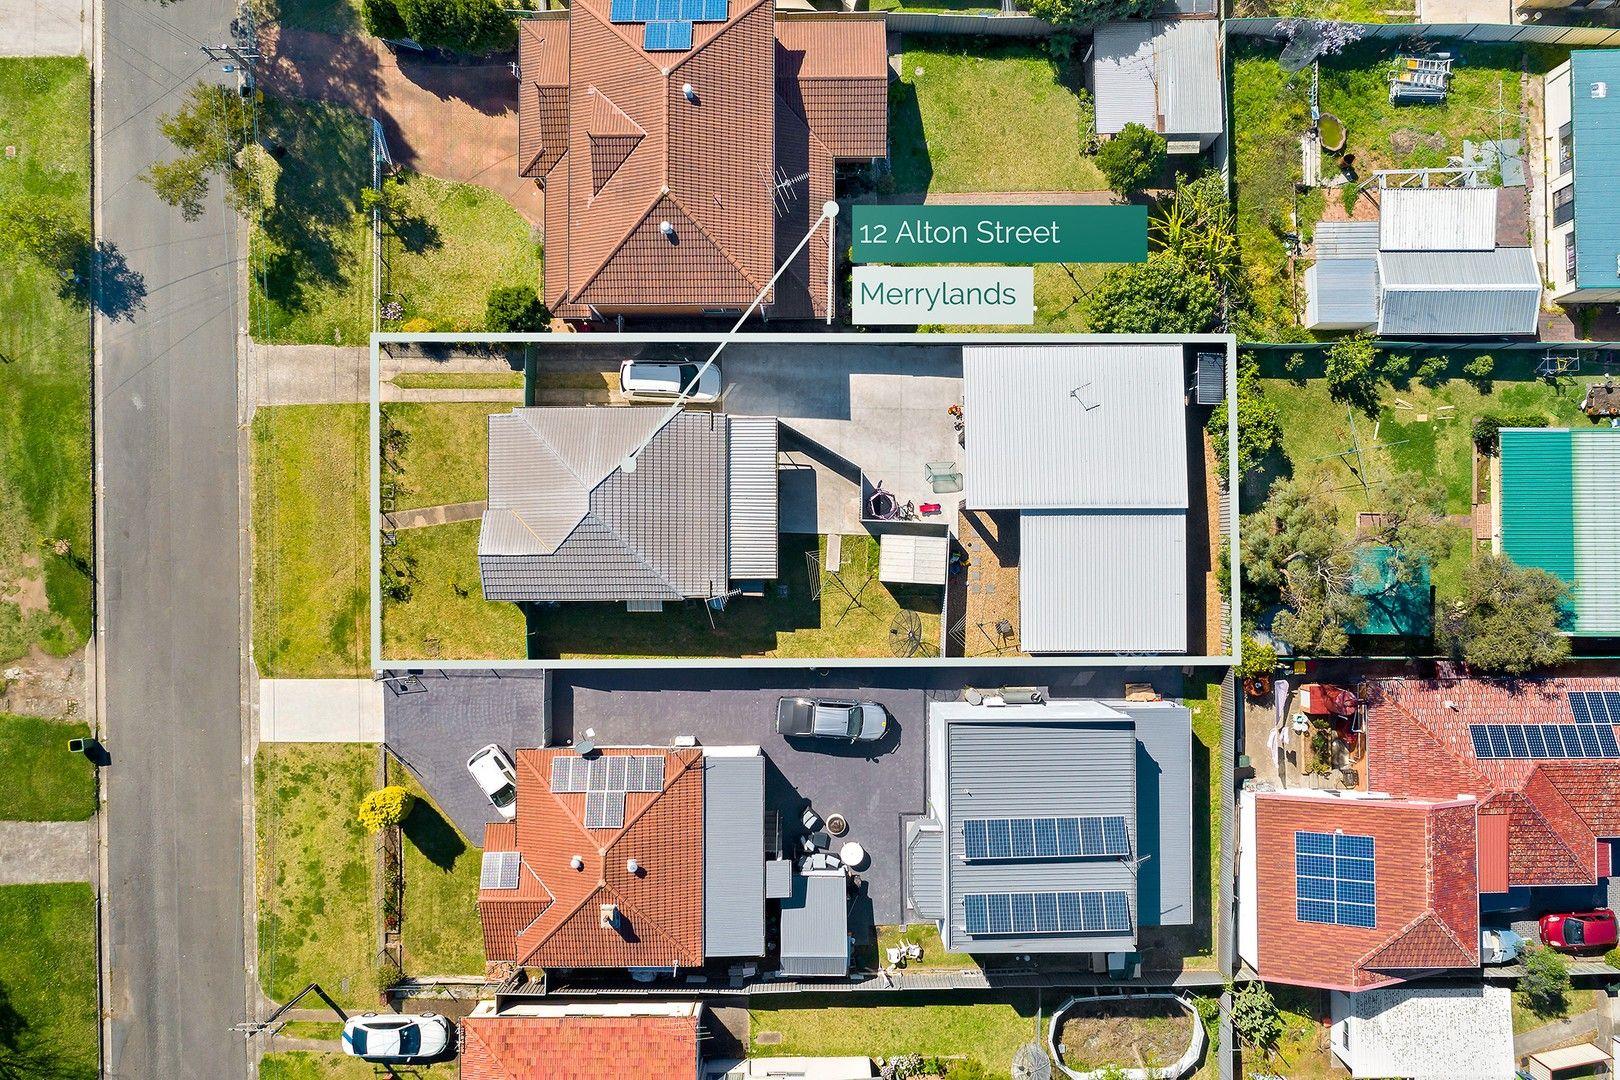 12 Alton Street, Merrylands NSW 2160, Image 0